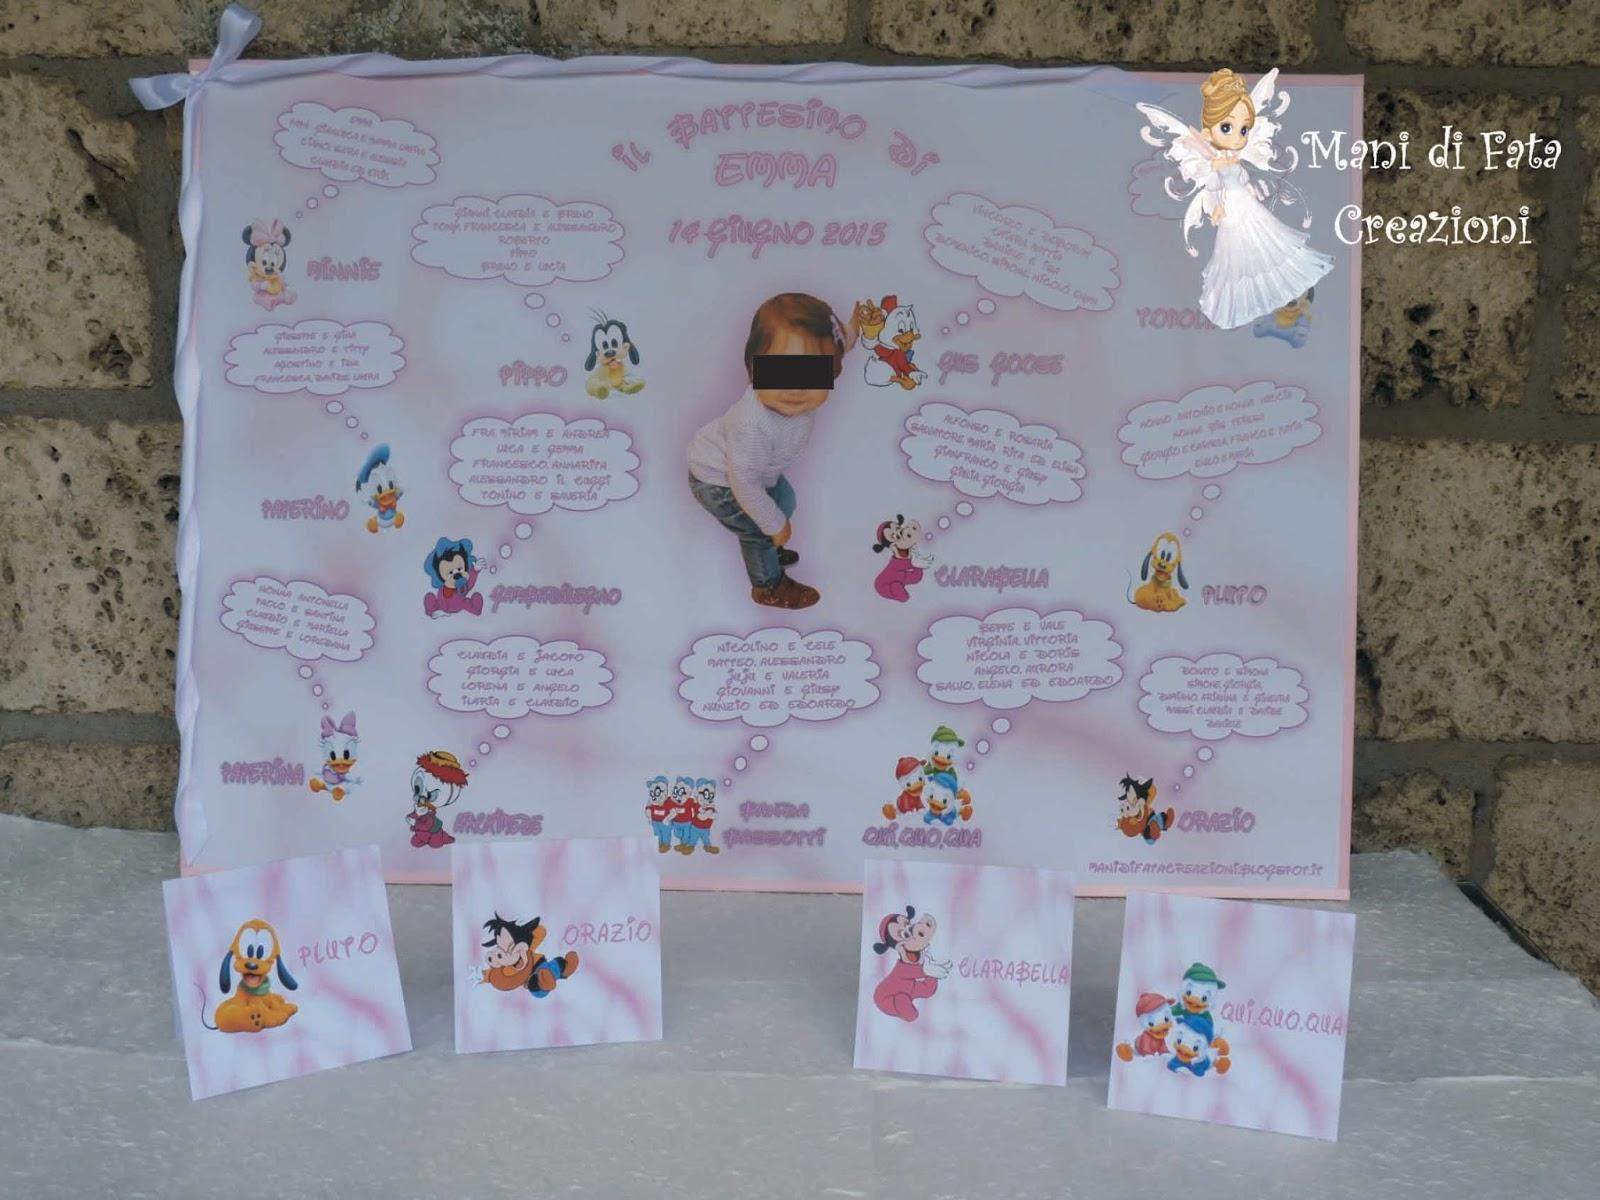 Bien connu Mani di Fata Creazioni: Tableau Battesimo Disney con foto TN07